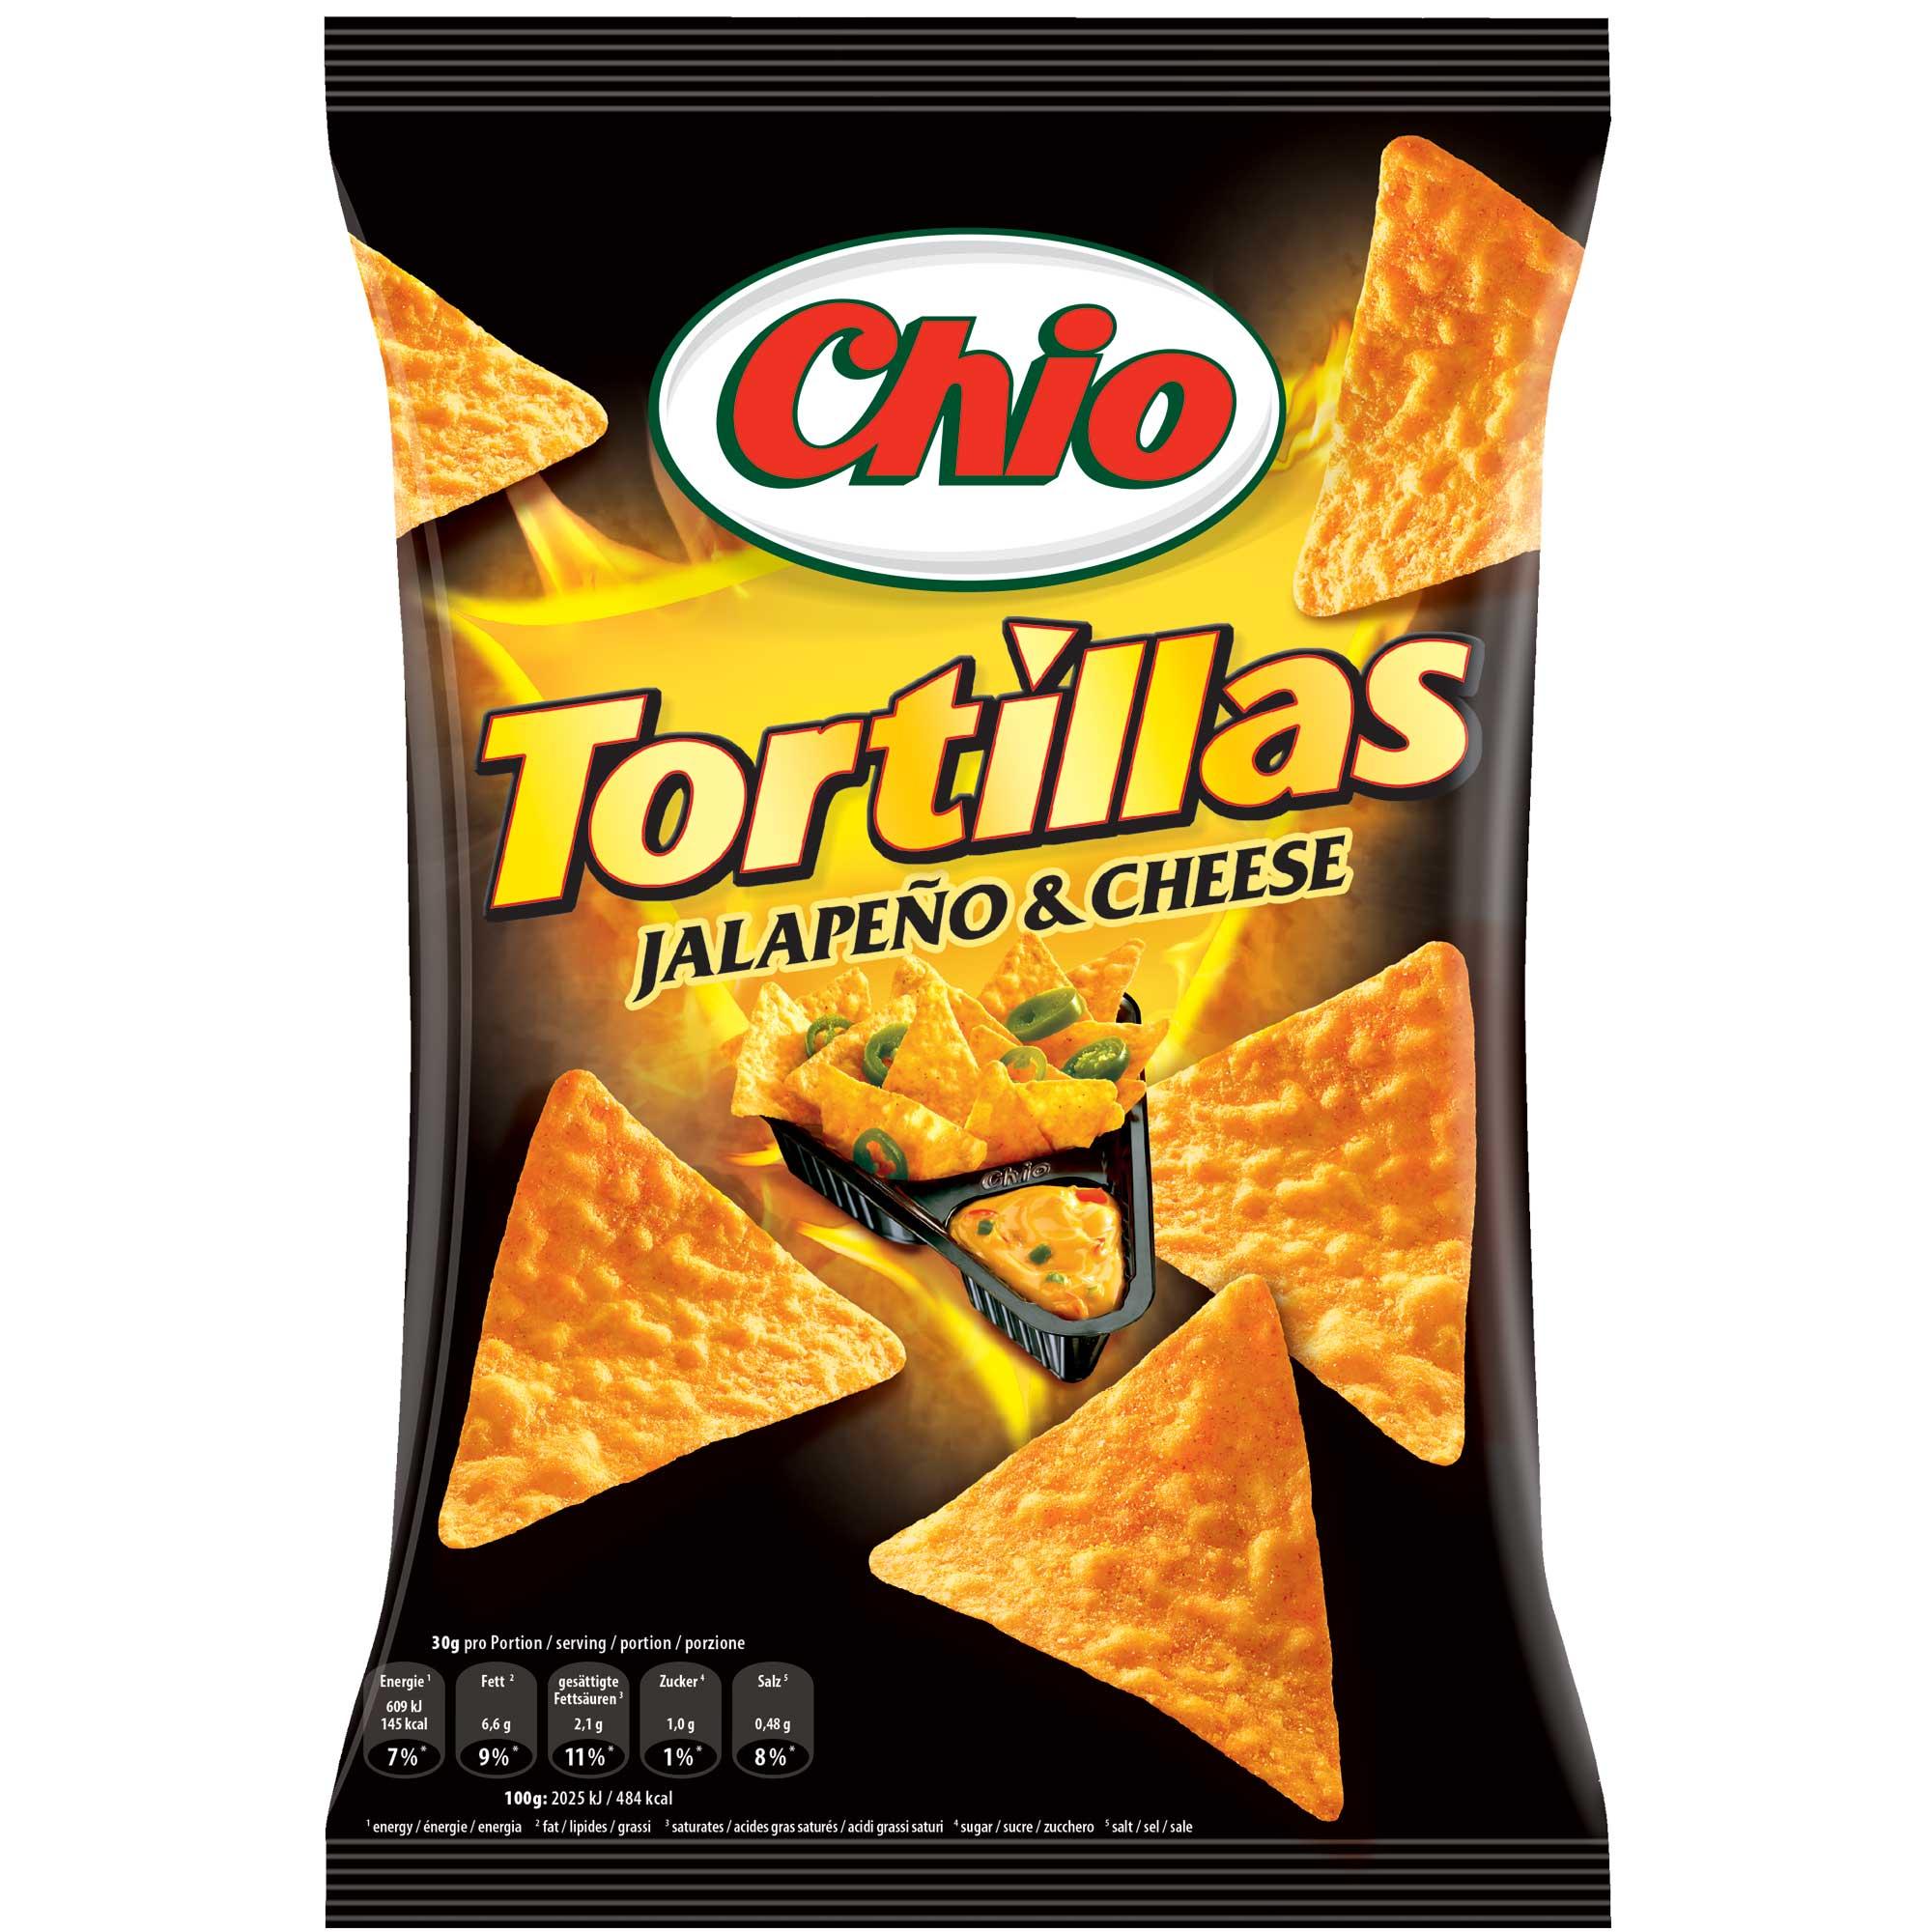 chio-tortillas-jalape-o--amp--cheese.jpg